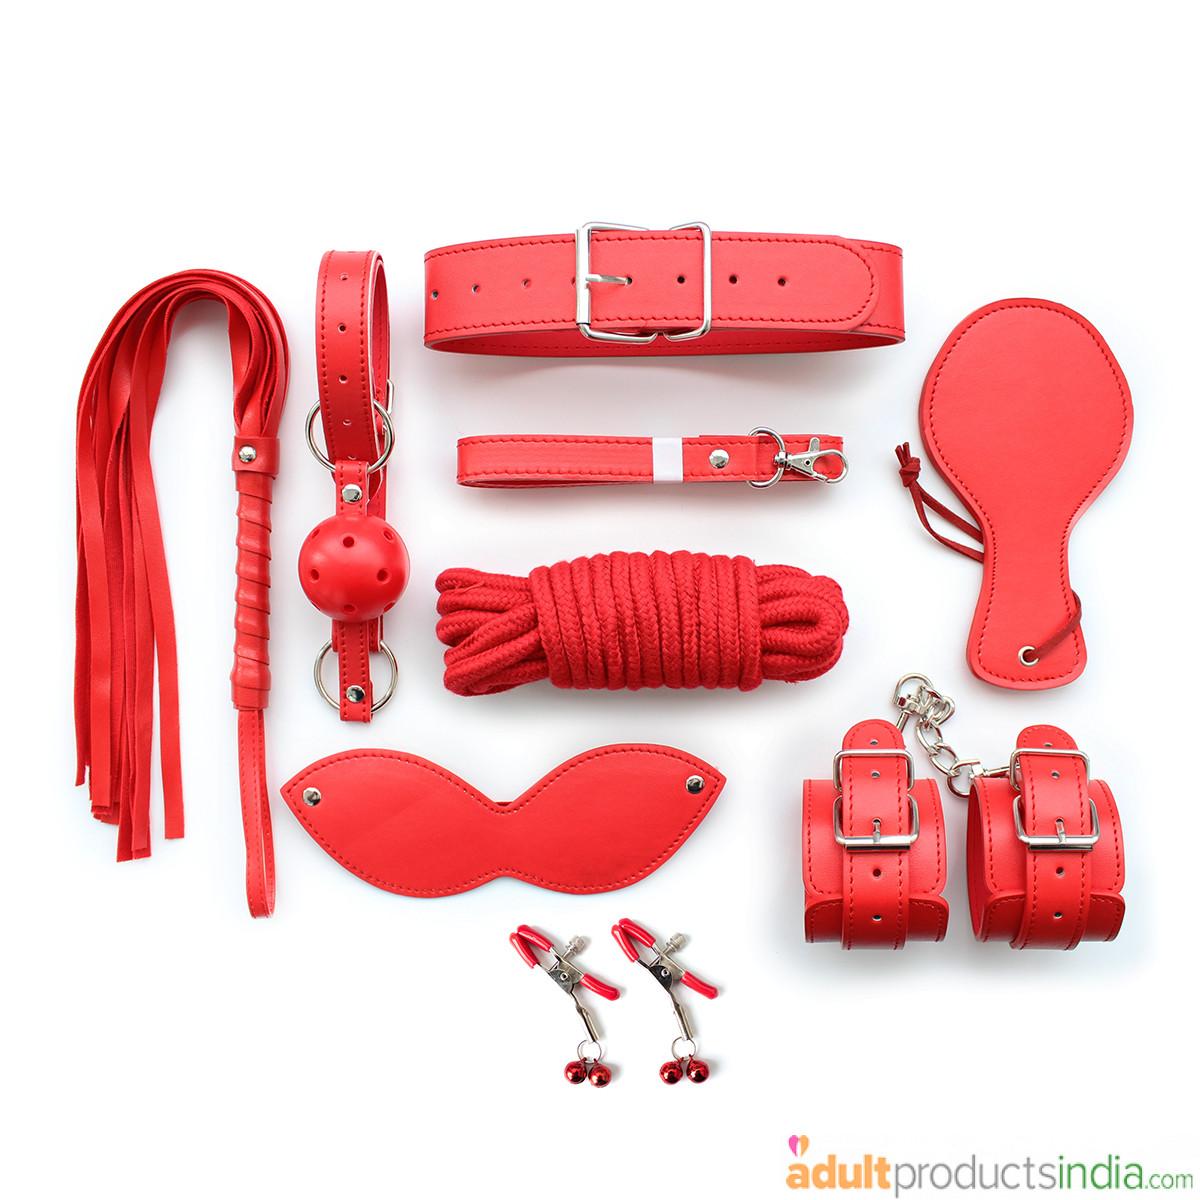 Bondage Set 8 Pcs in Red Color